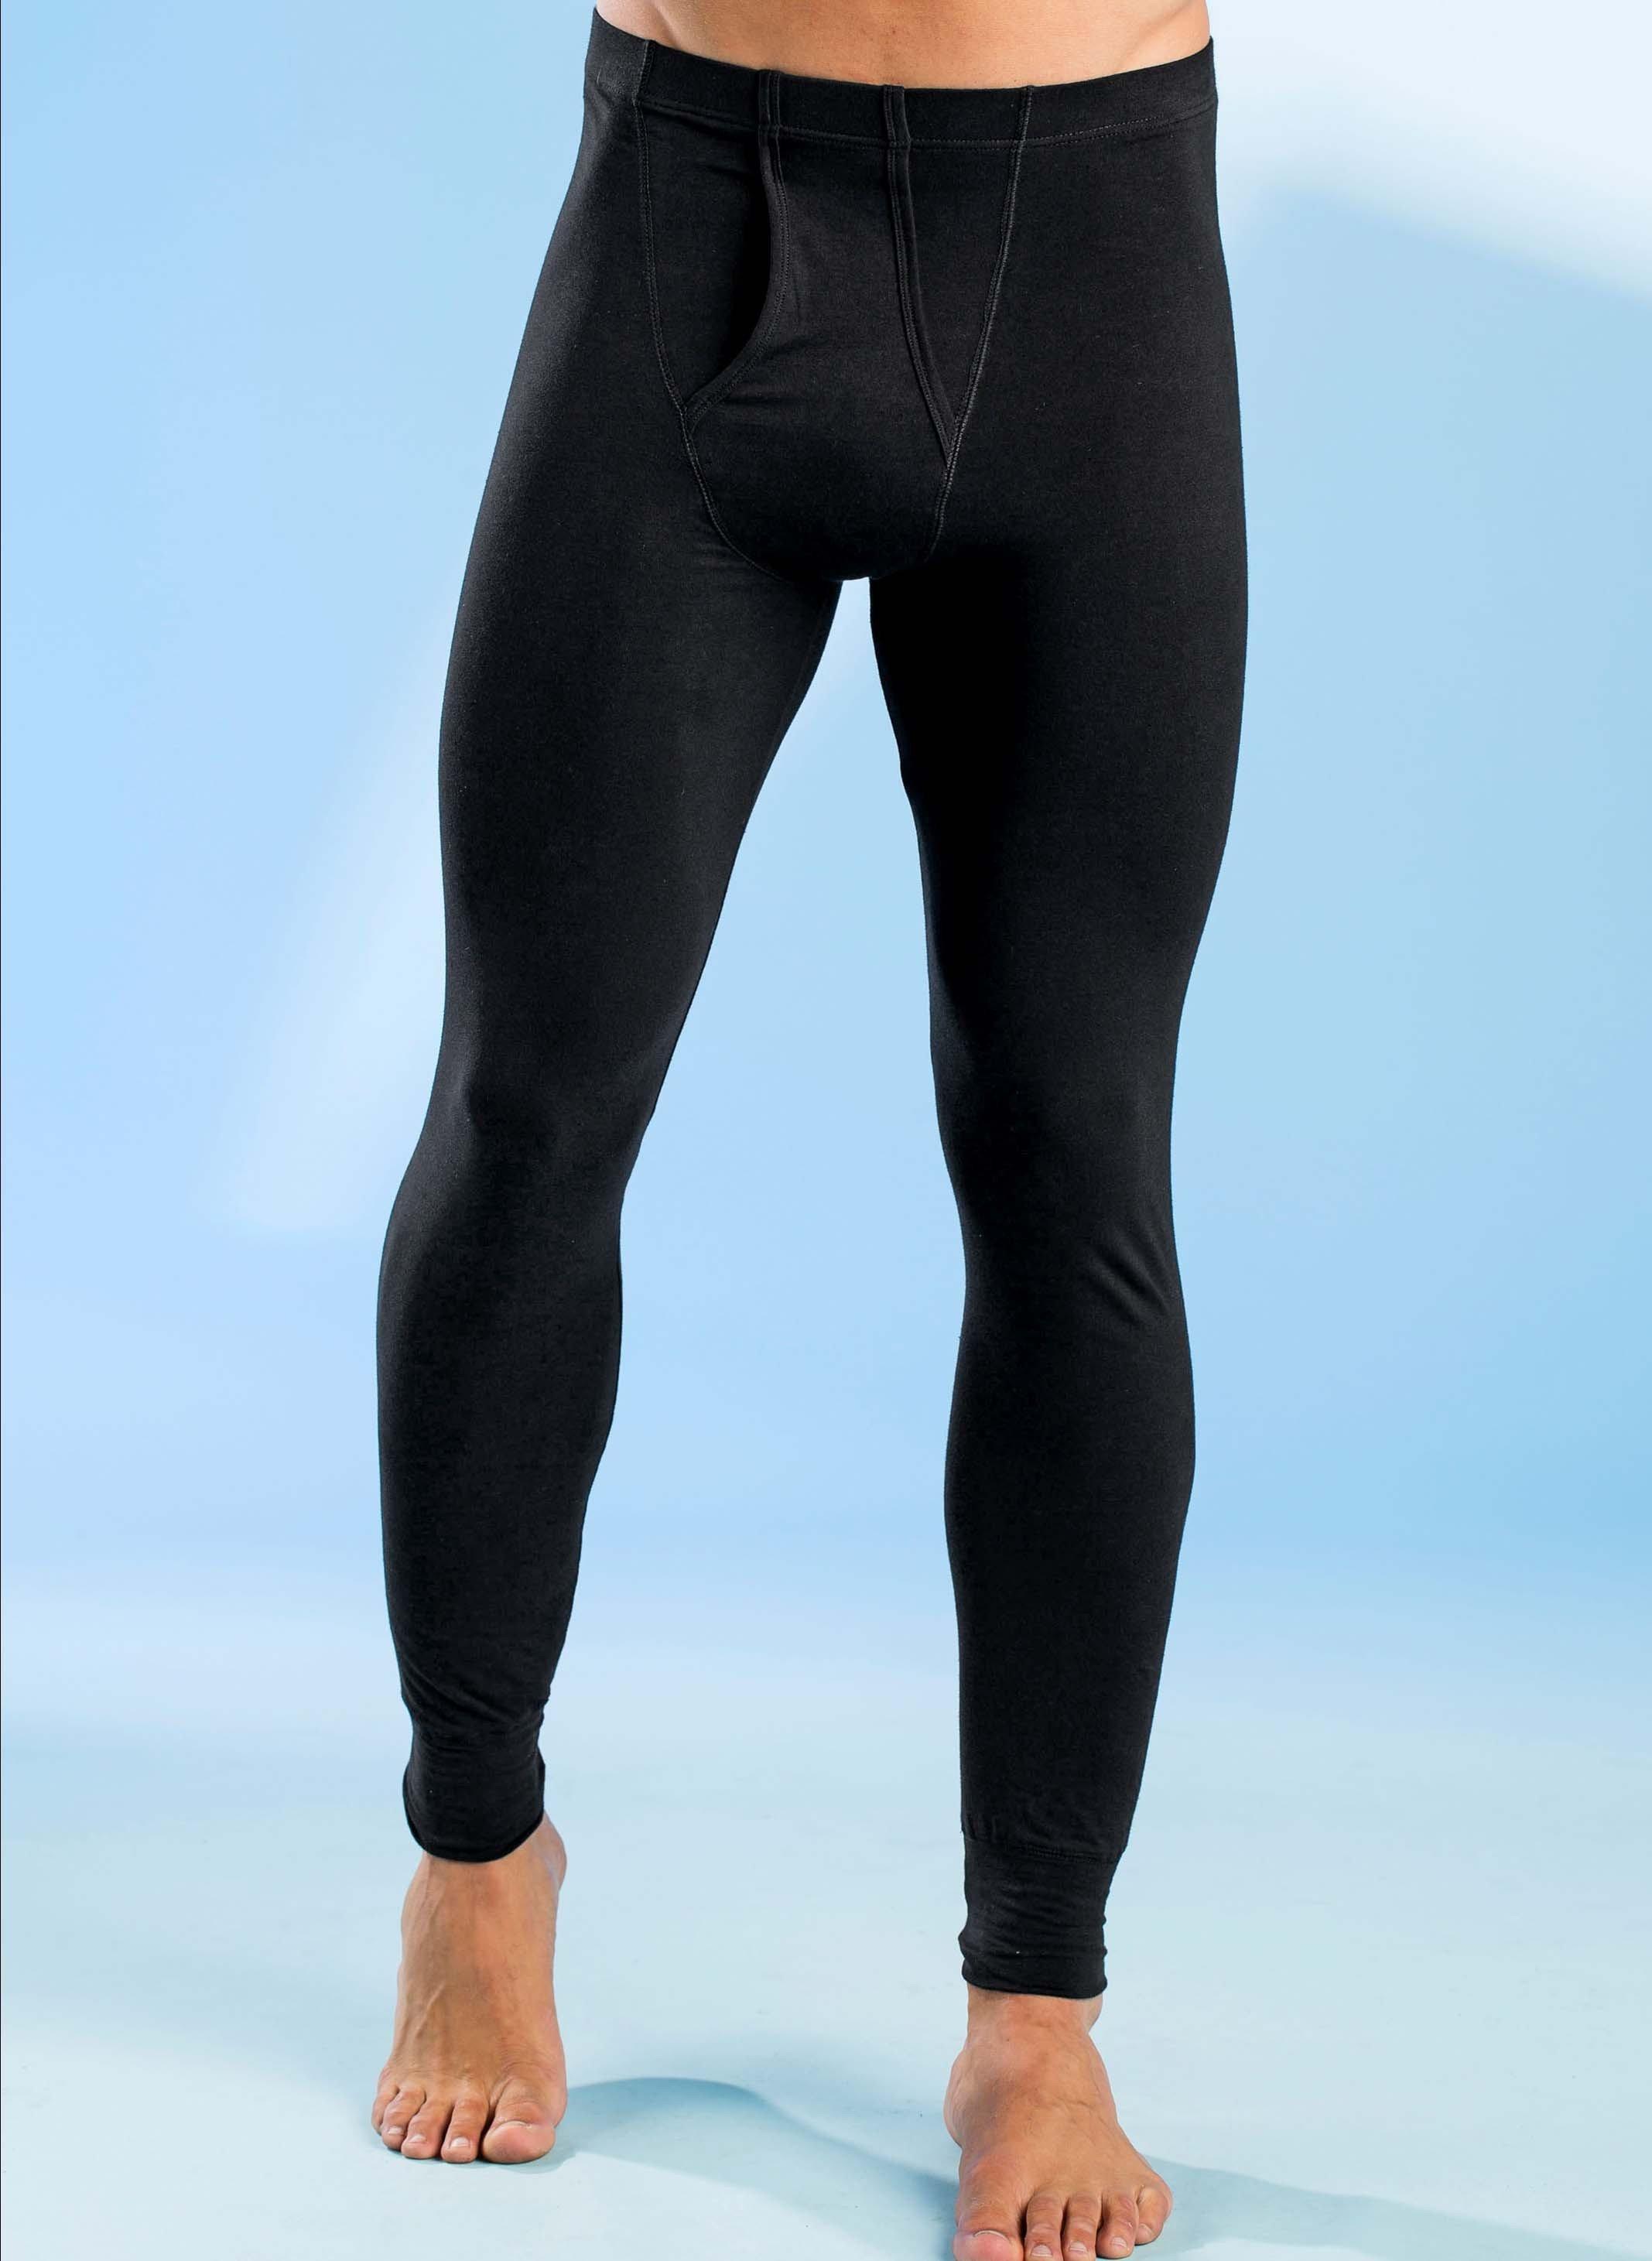 H-Unterhose-lang,schwarz 2er-S L 010